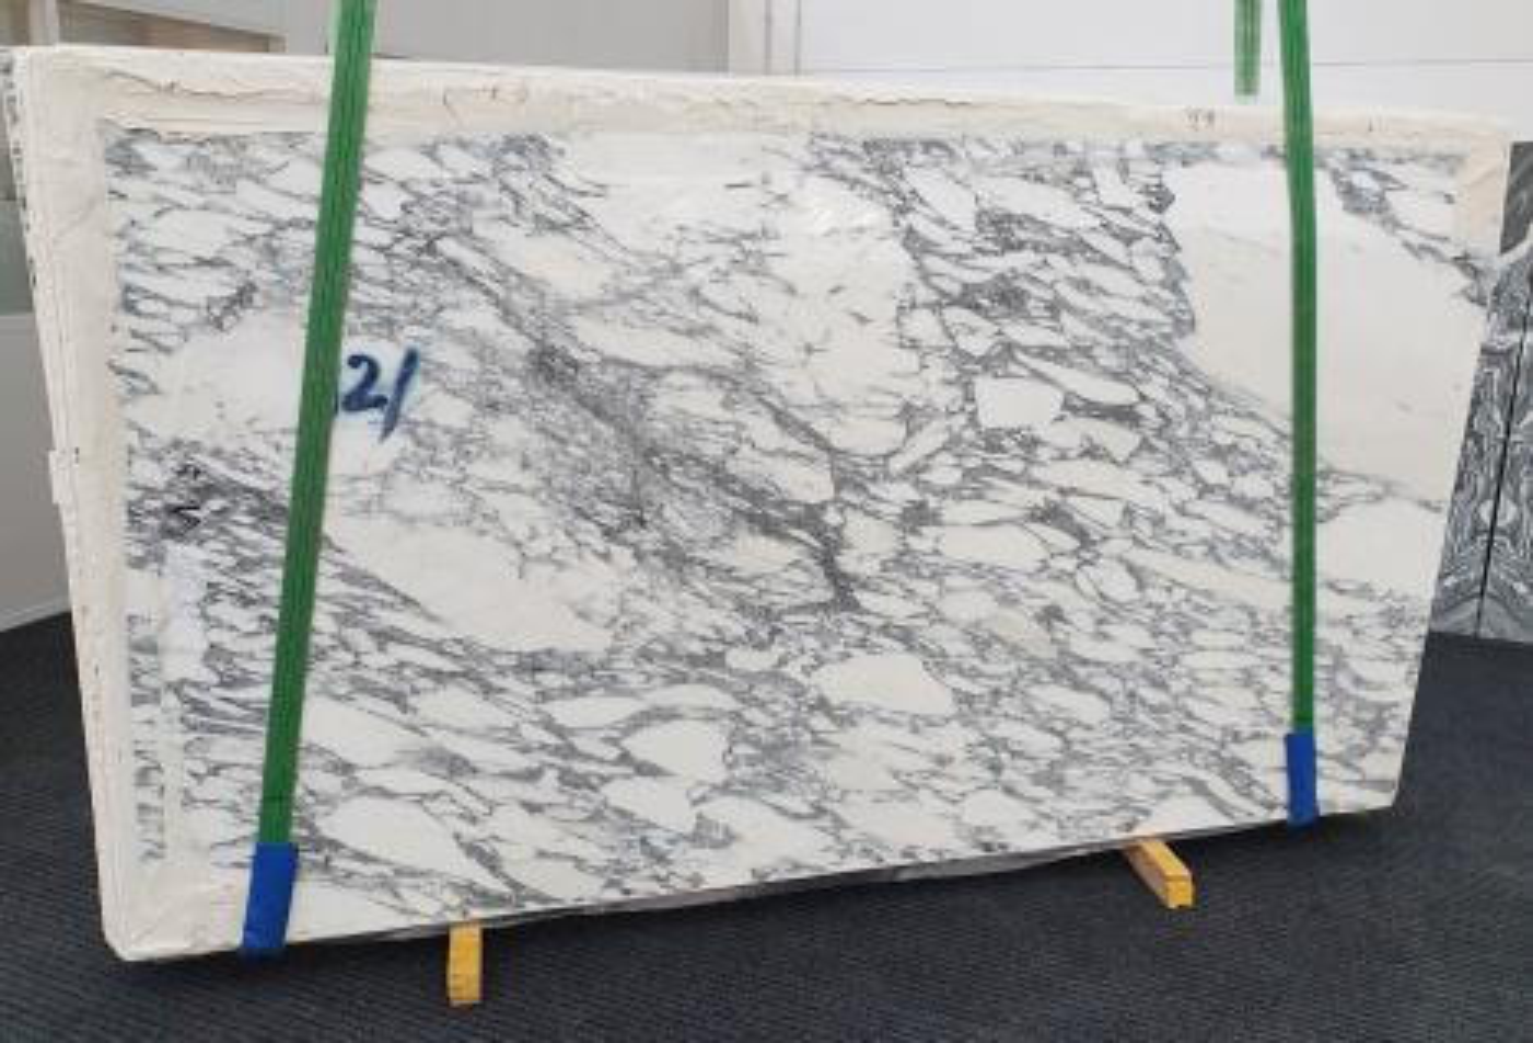 ARABESCATO CORCHIA polierte Unmaßplatten 1420 aus Natur Marmor , Slab #73: Lieferung Veneto, Italien